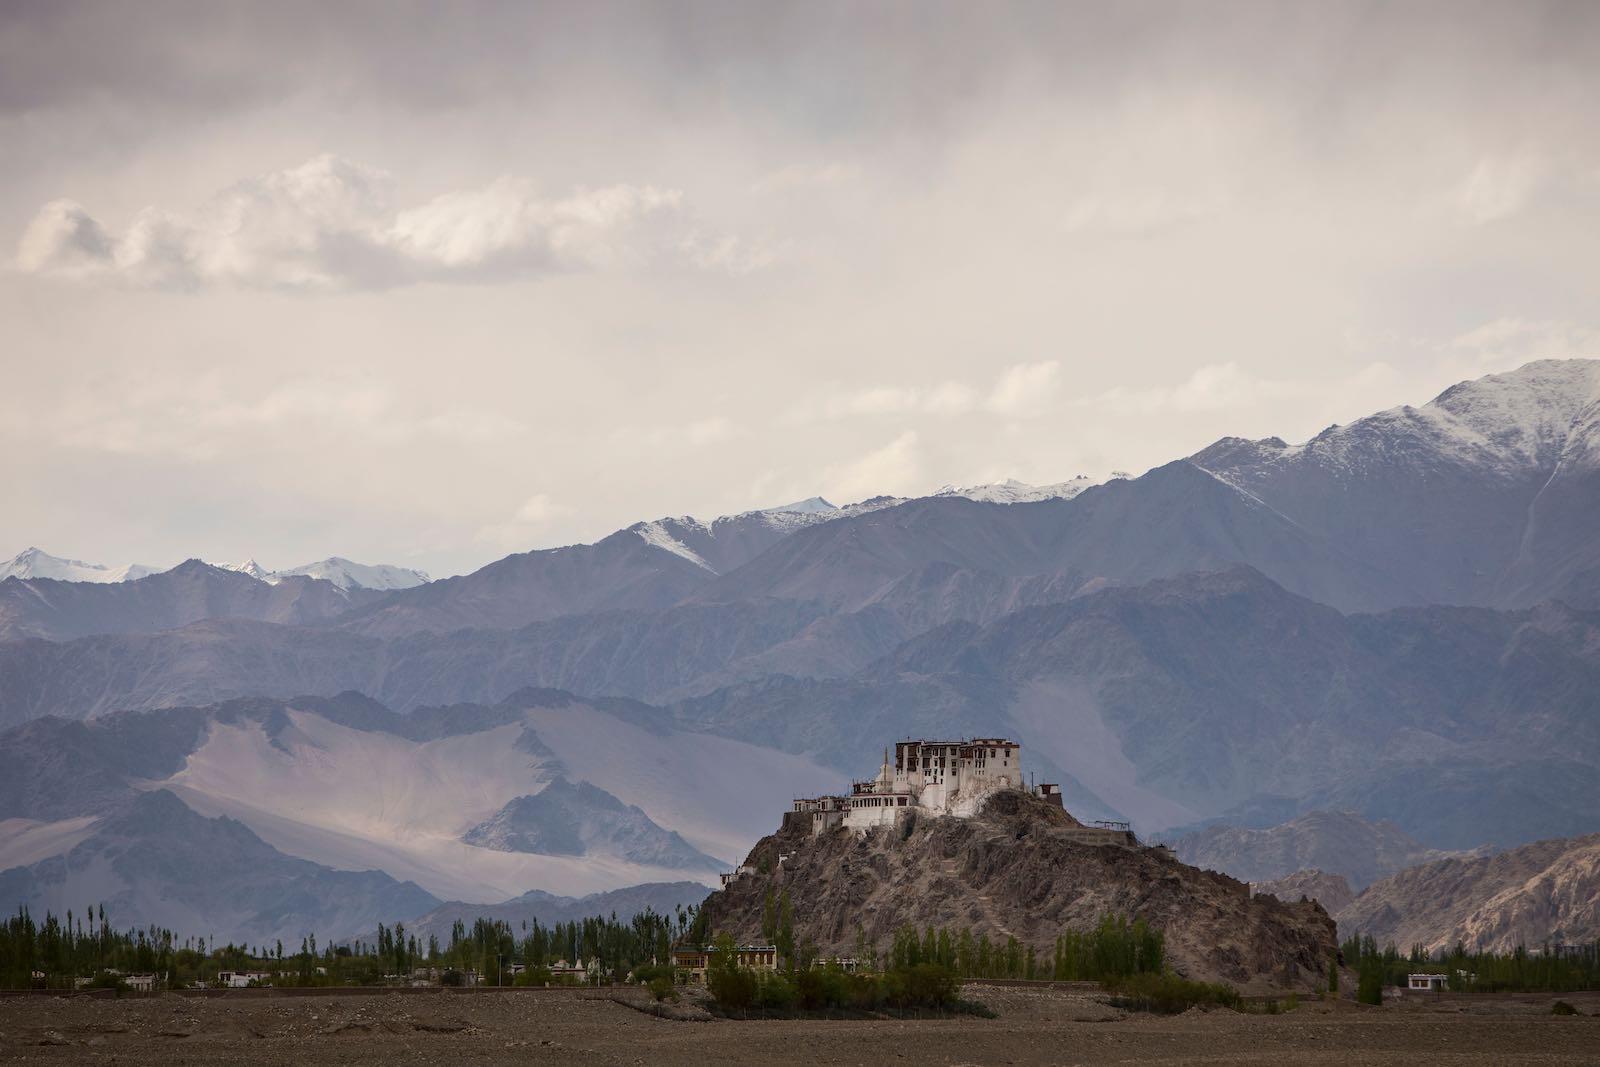 Stakna Monastery near Leh in the northern Indian state of Ladakh (Photo: Xavier Galiana via Getty)